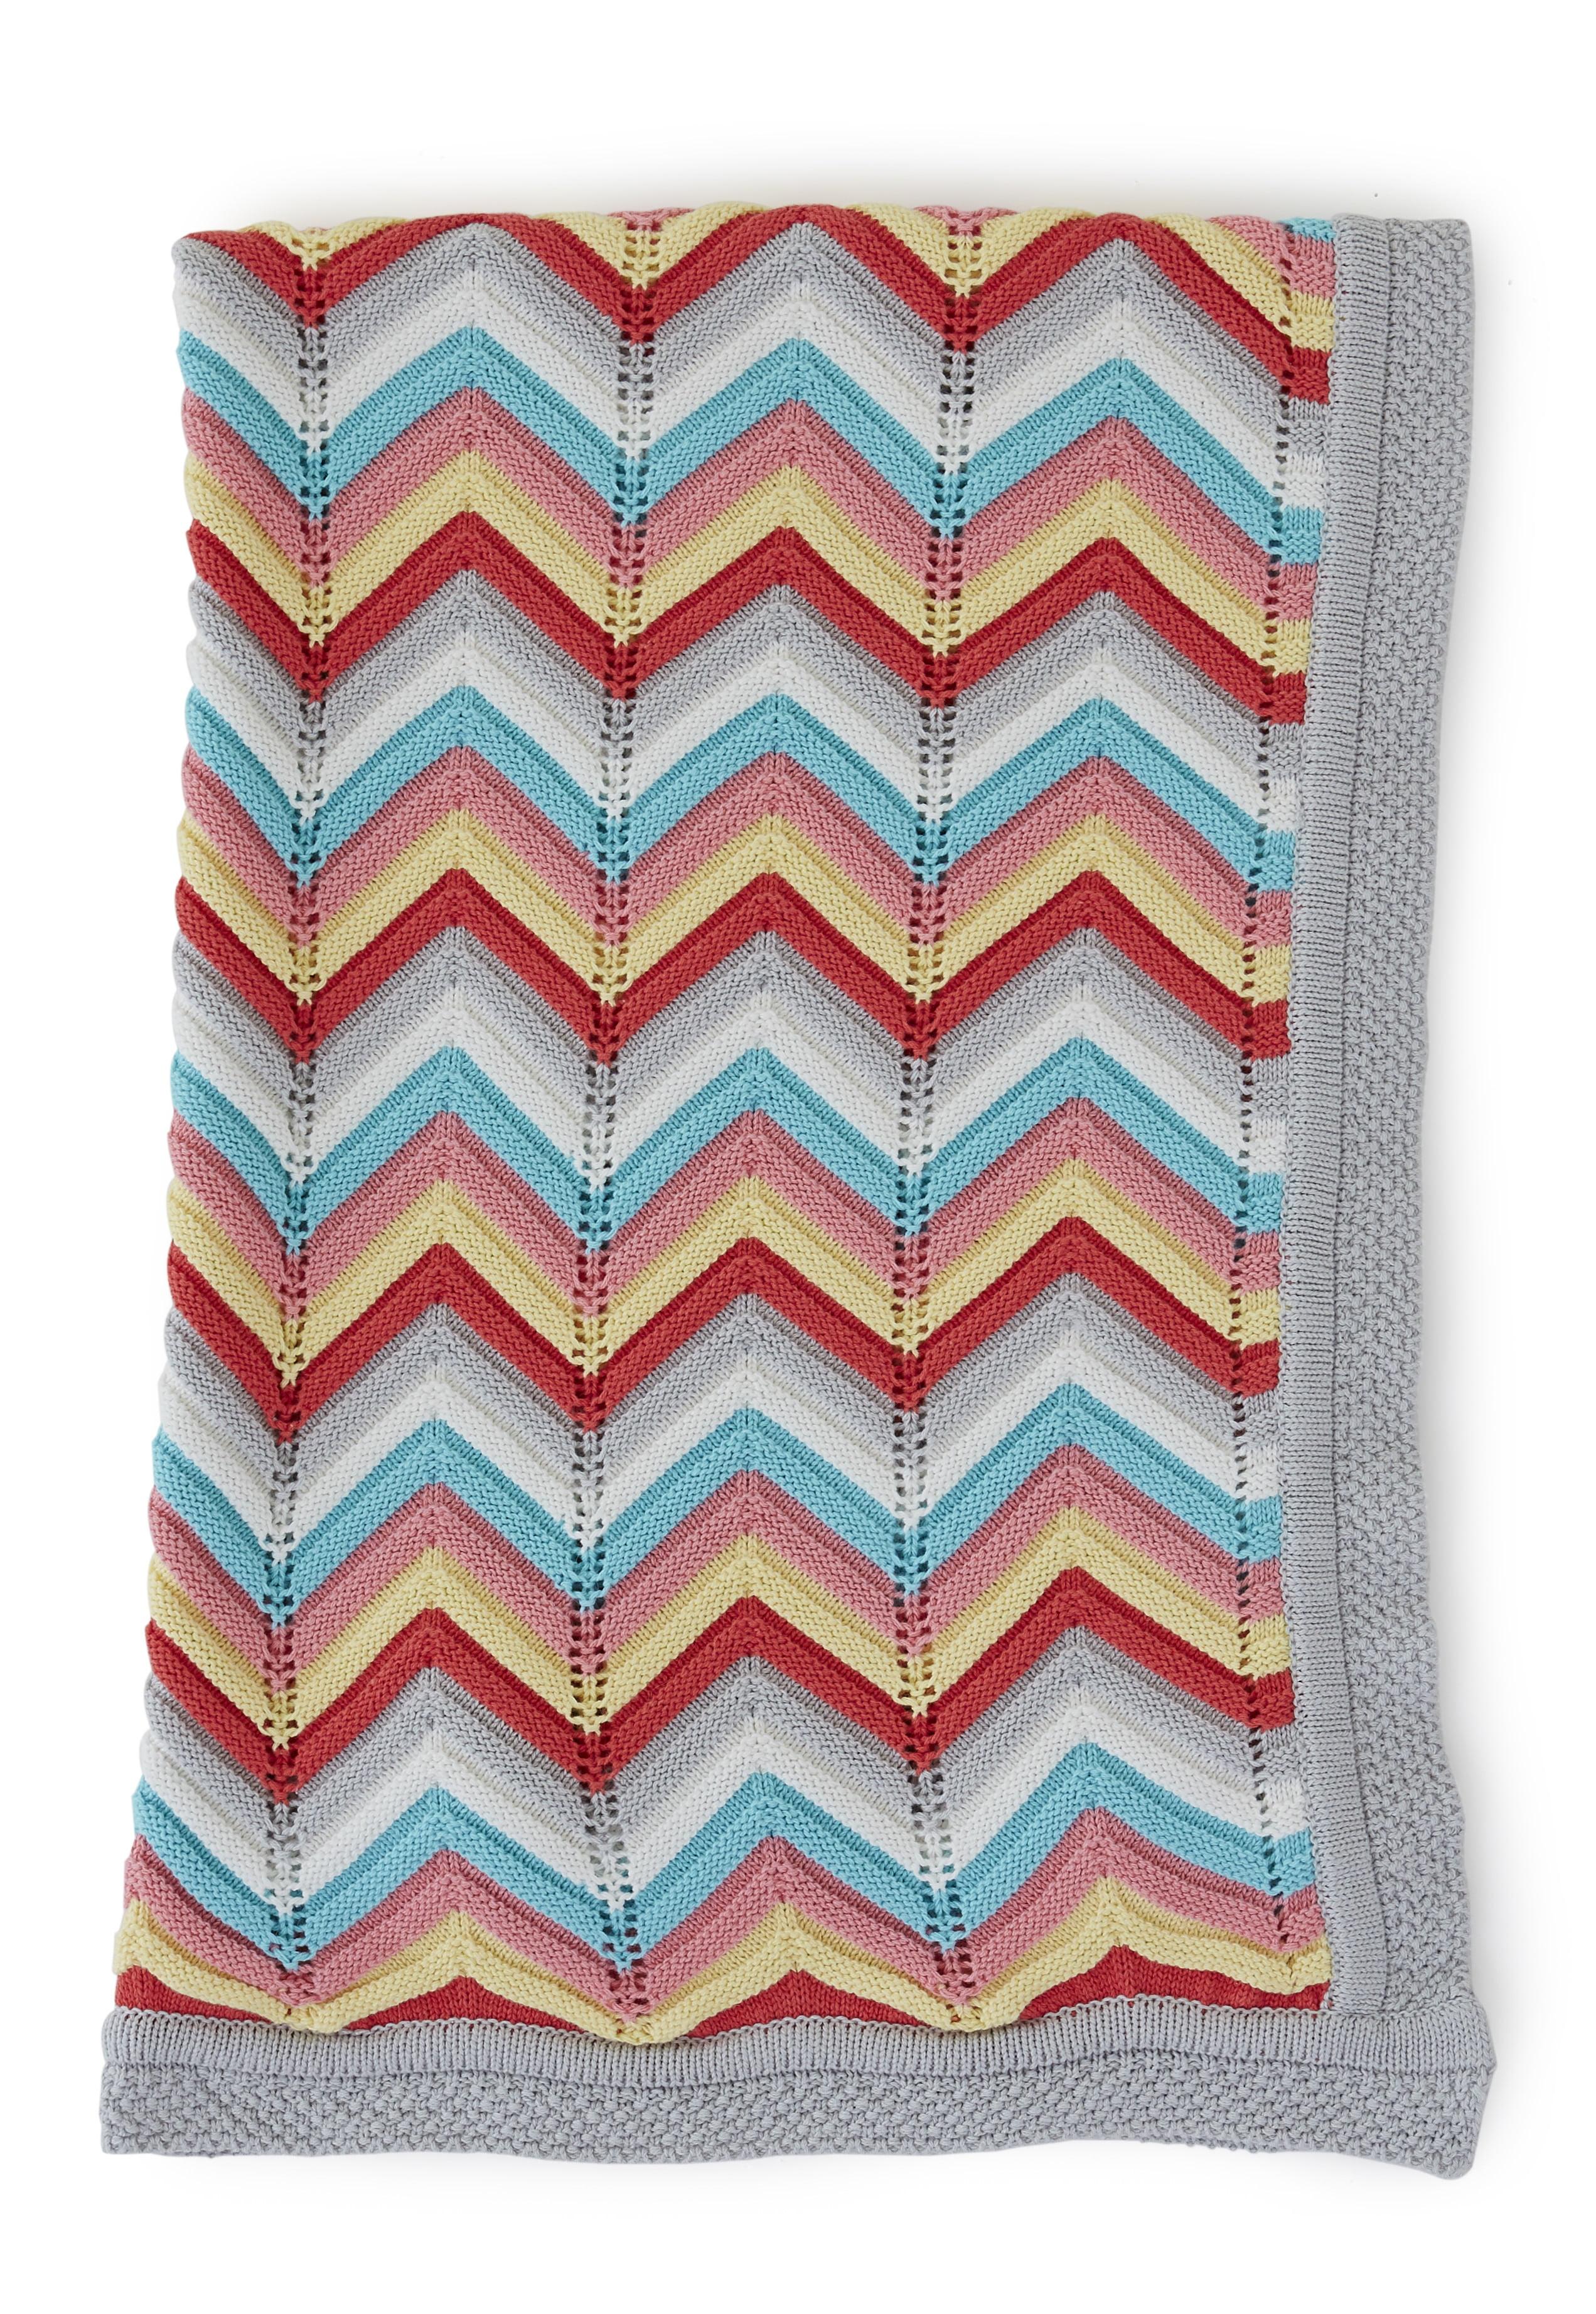 "The Little Acorn ""Rainbow"" Knit Blanket by The Little Acorn"